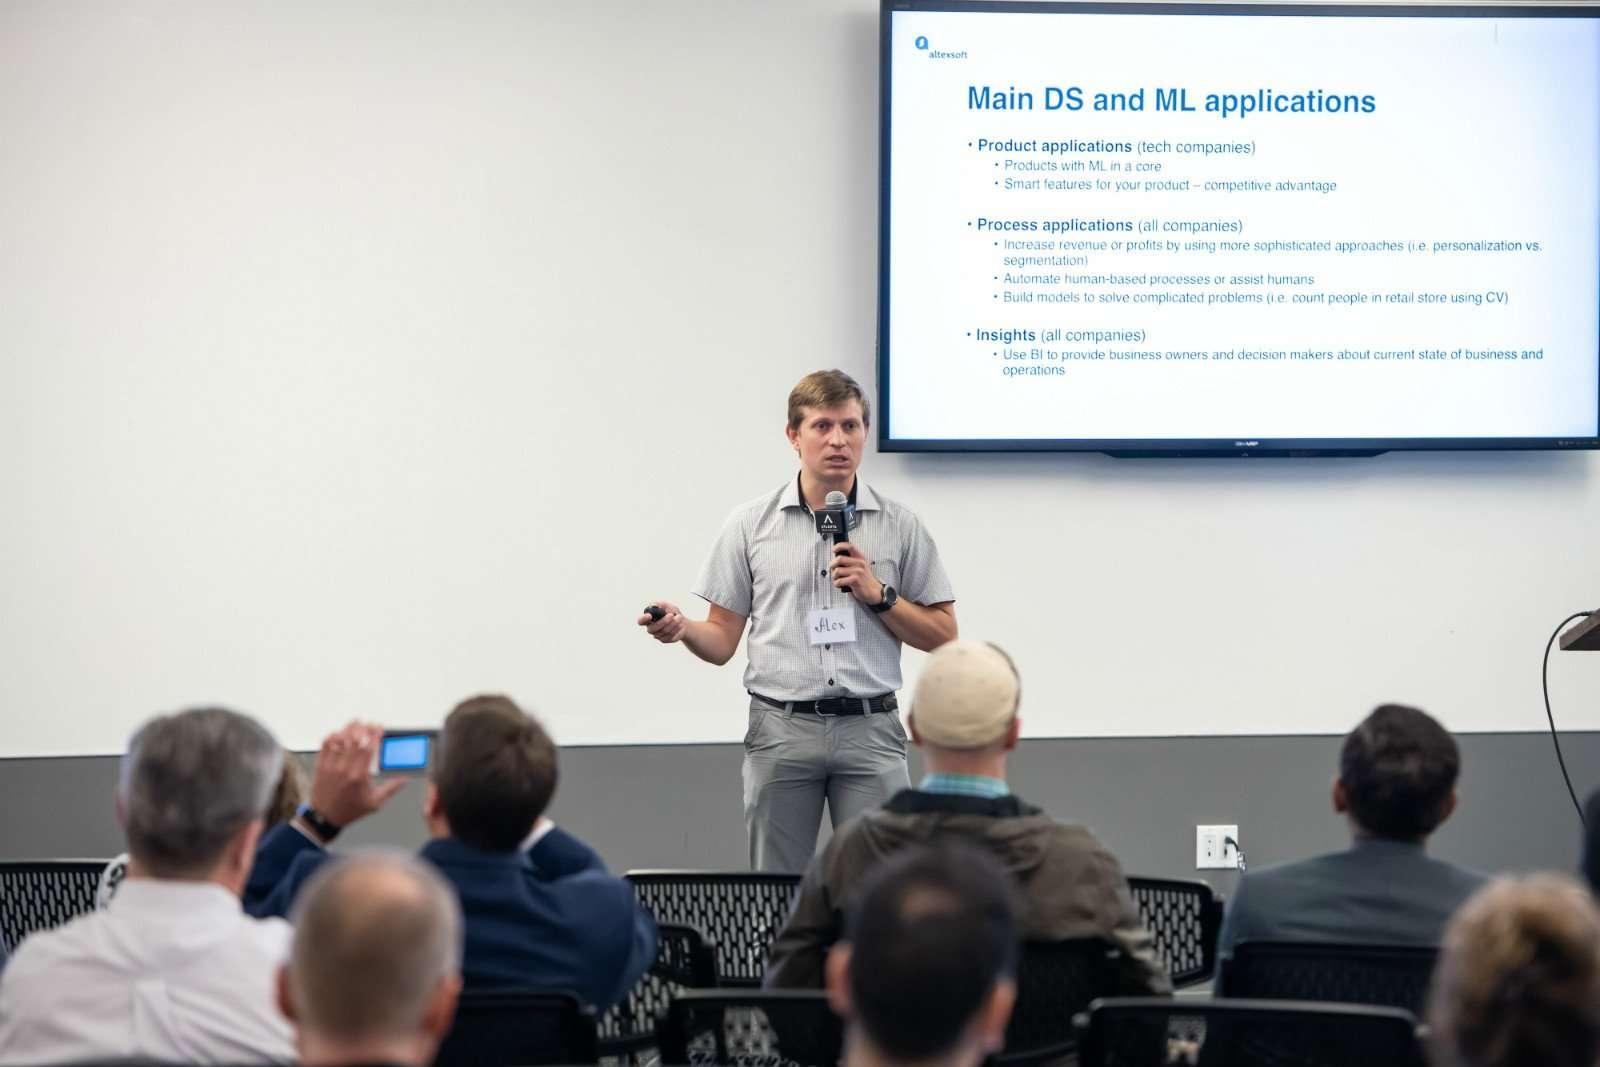 meetup presentation